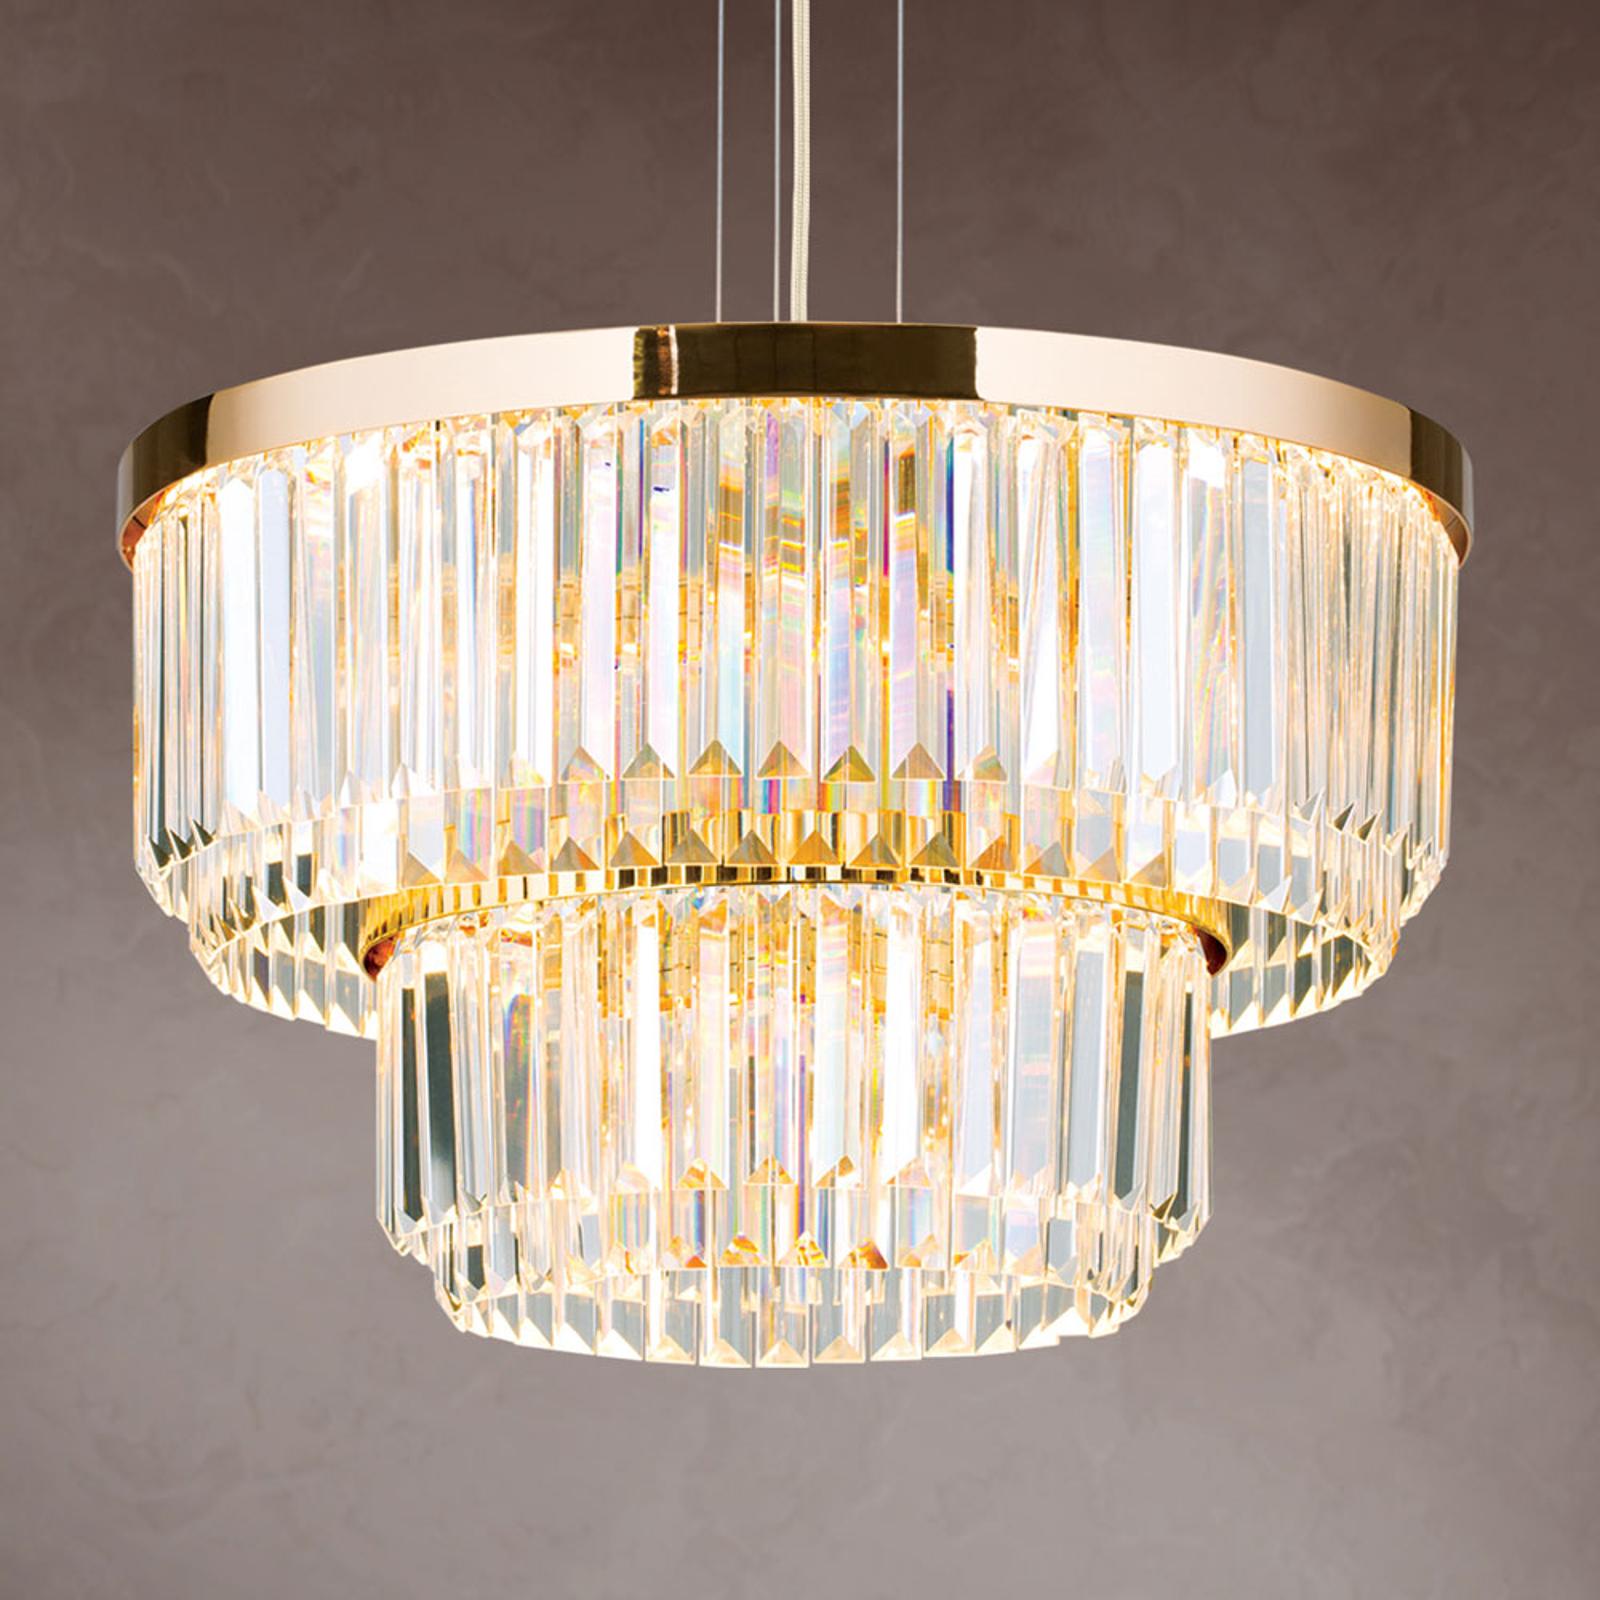 LED-hengelampe Prisme, rund, gull